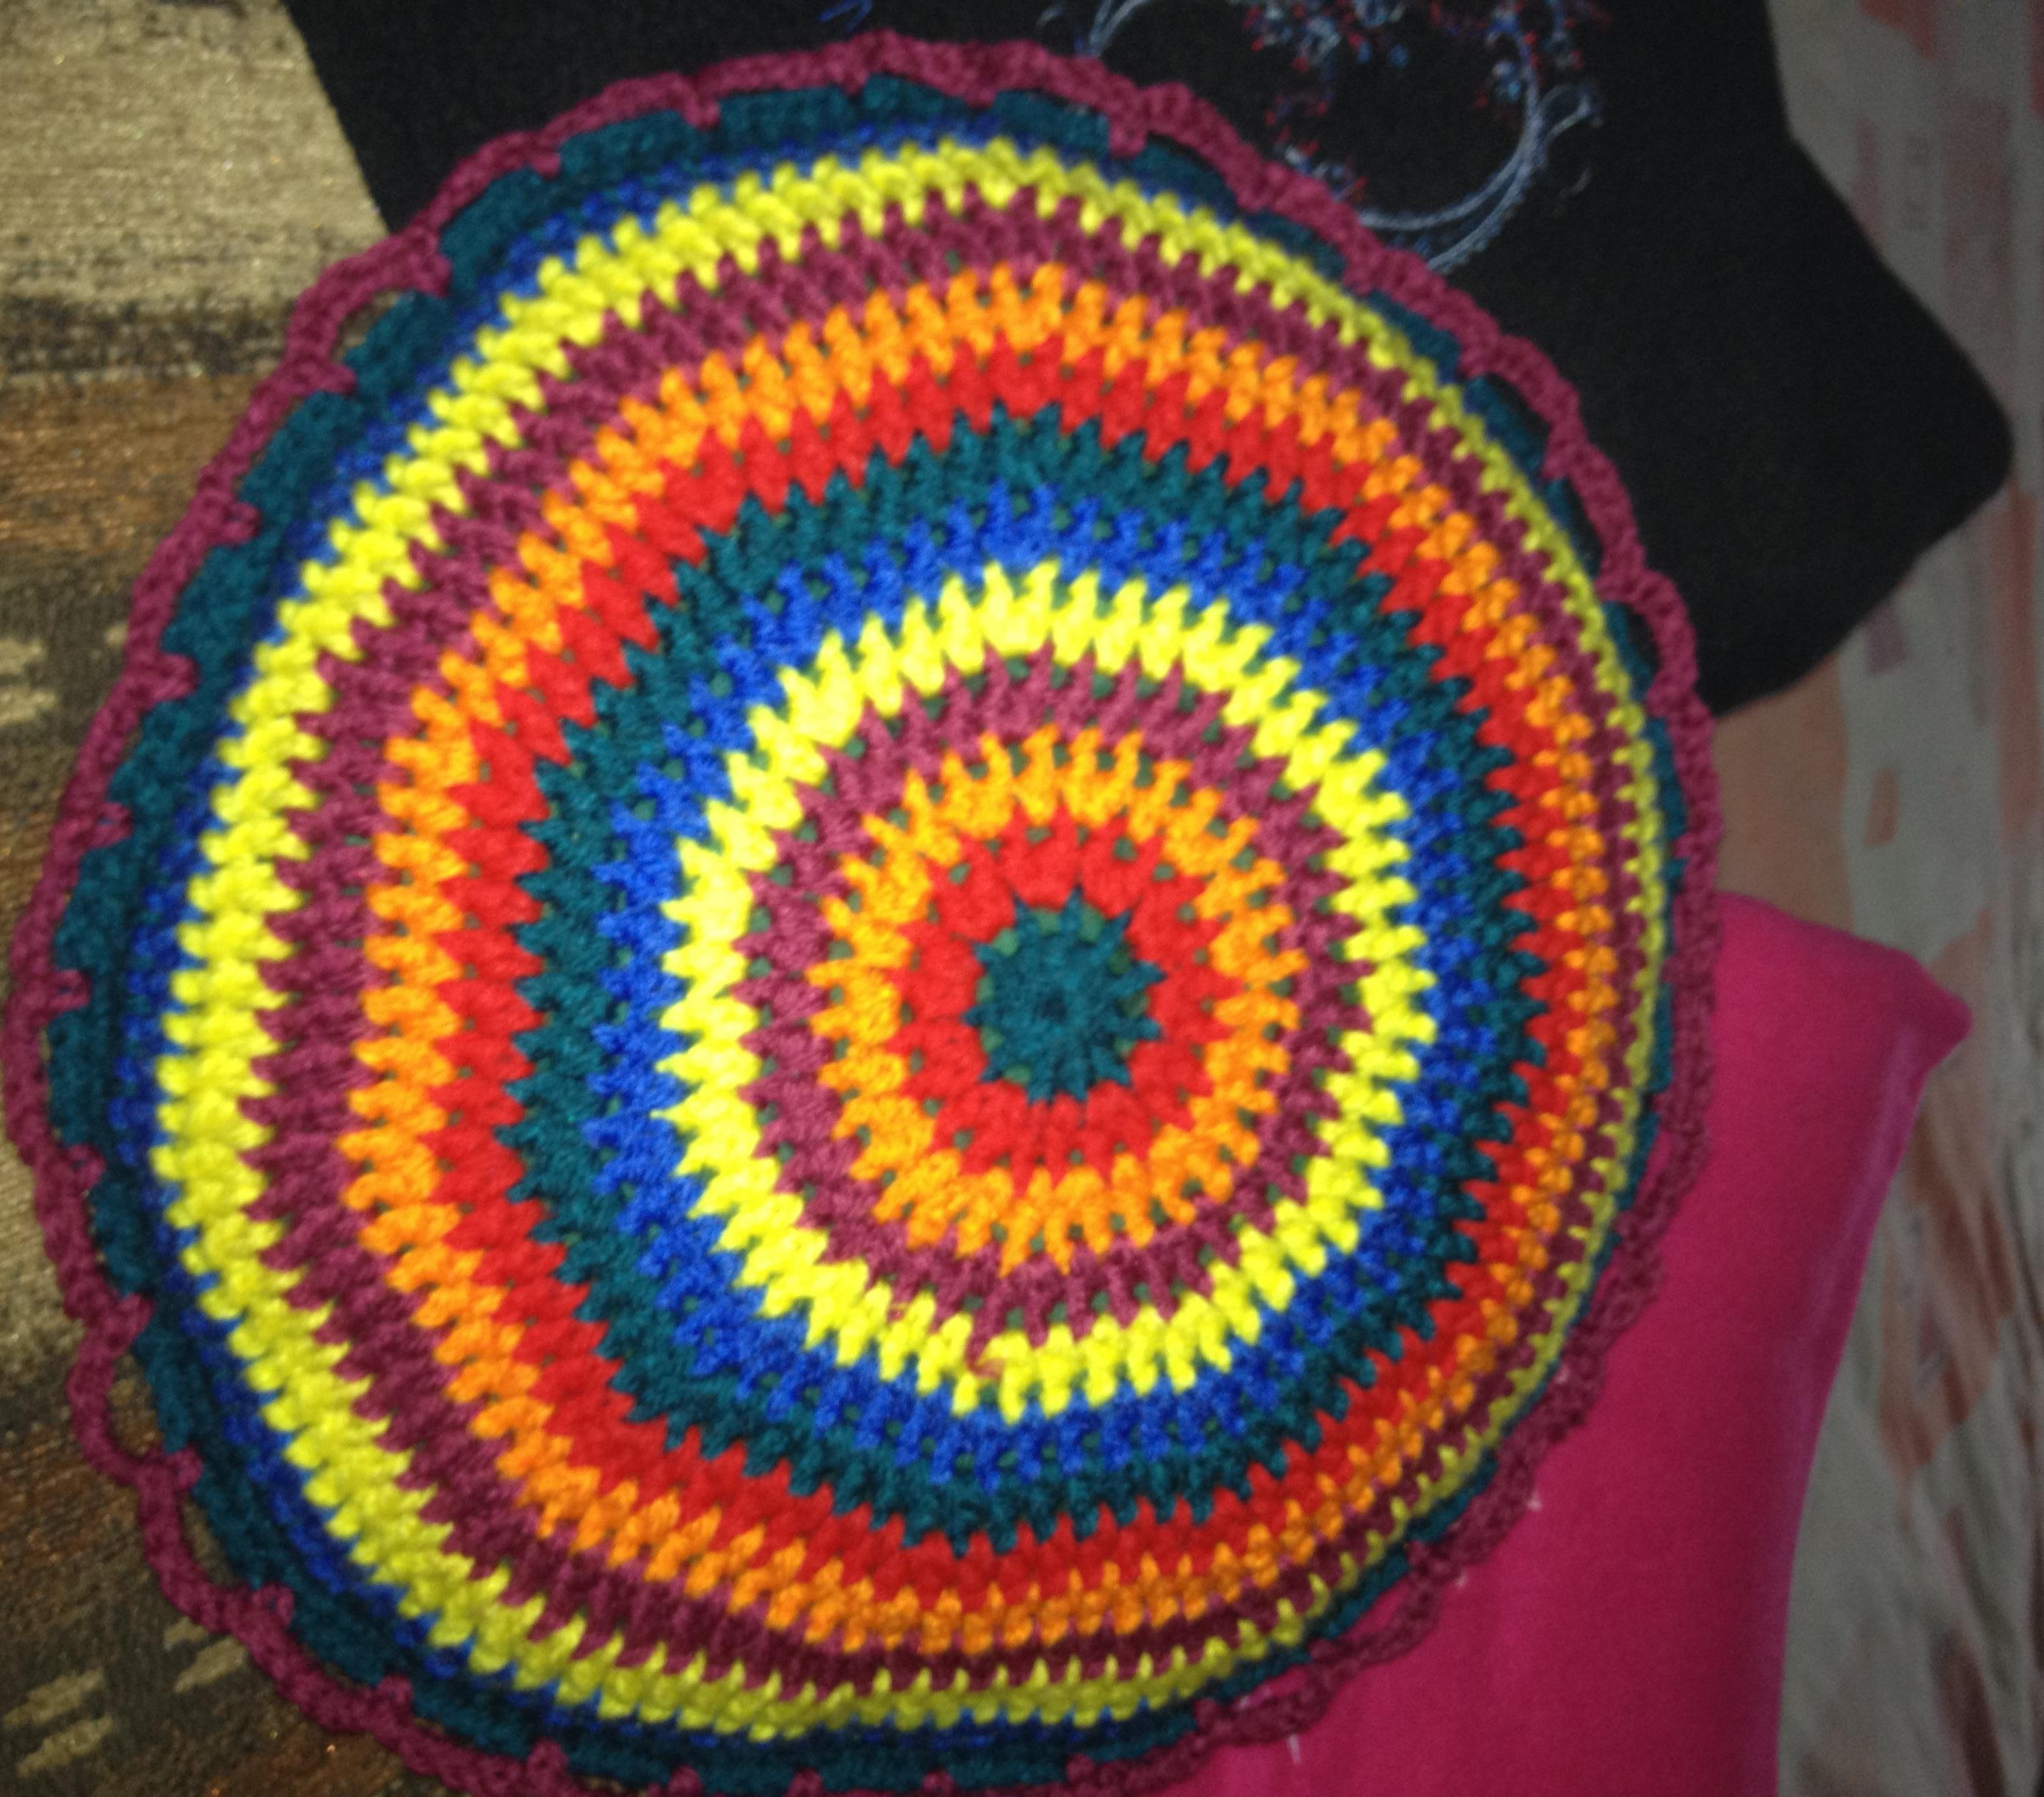 Octubre 2012 hecho a mano por maricruz pacheco barrios - Cojin de crochet ...